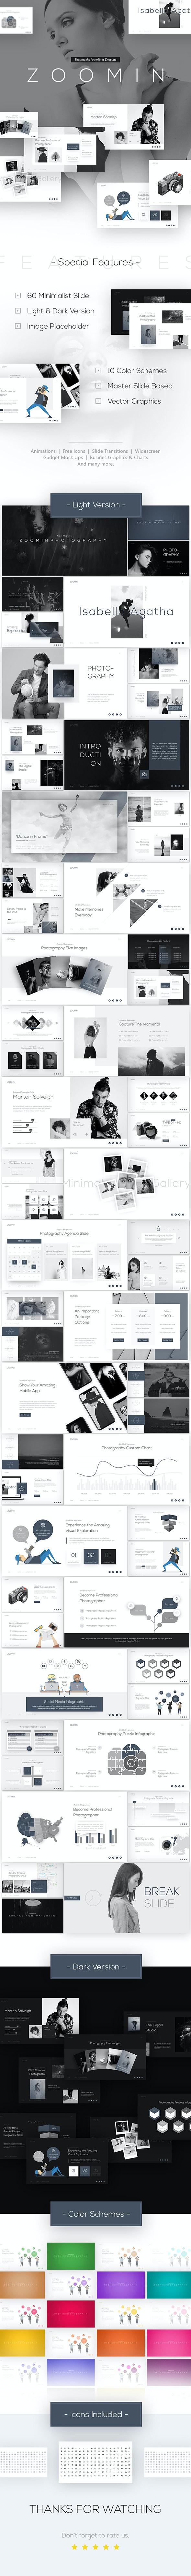 Zoomin Portfolio & Photography PowerPoint Template - PowerPoint Templates Presentation Templates